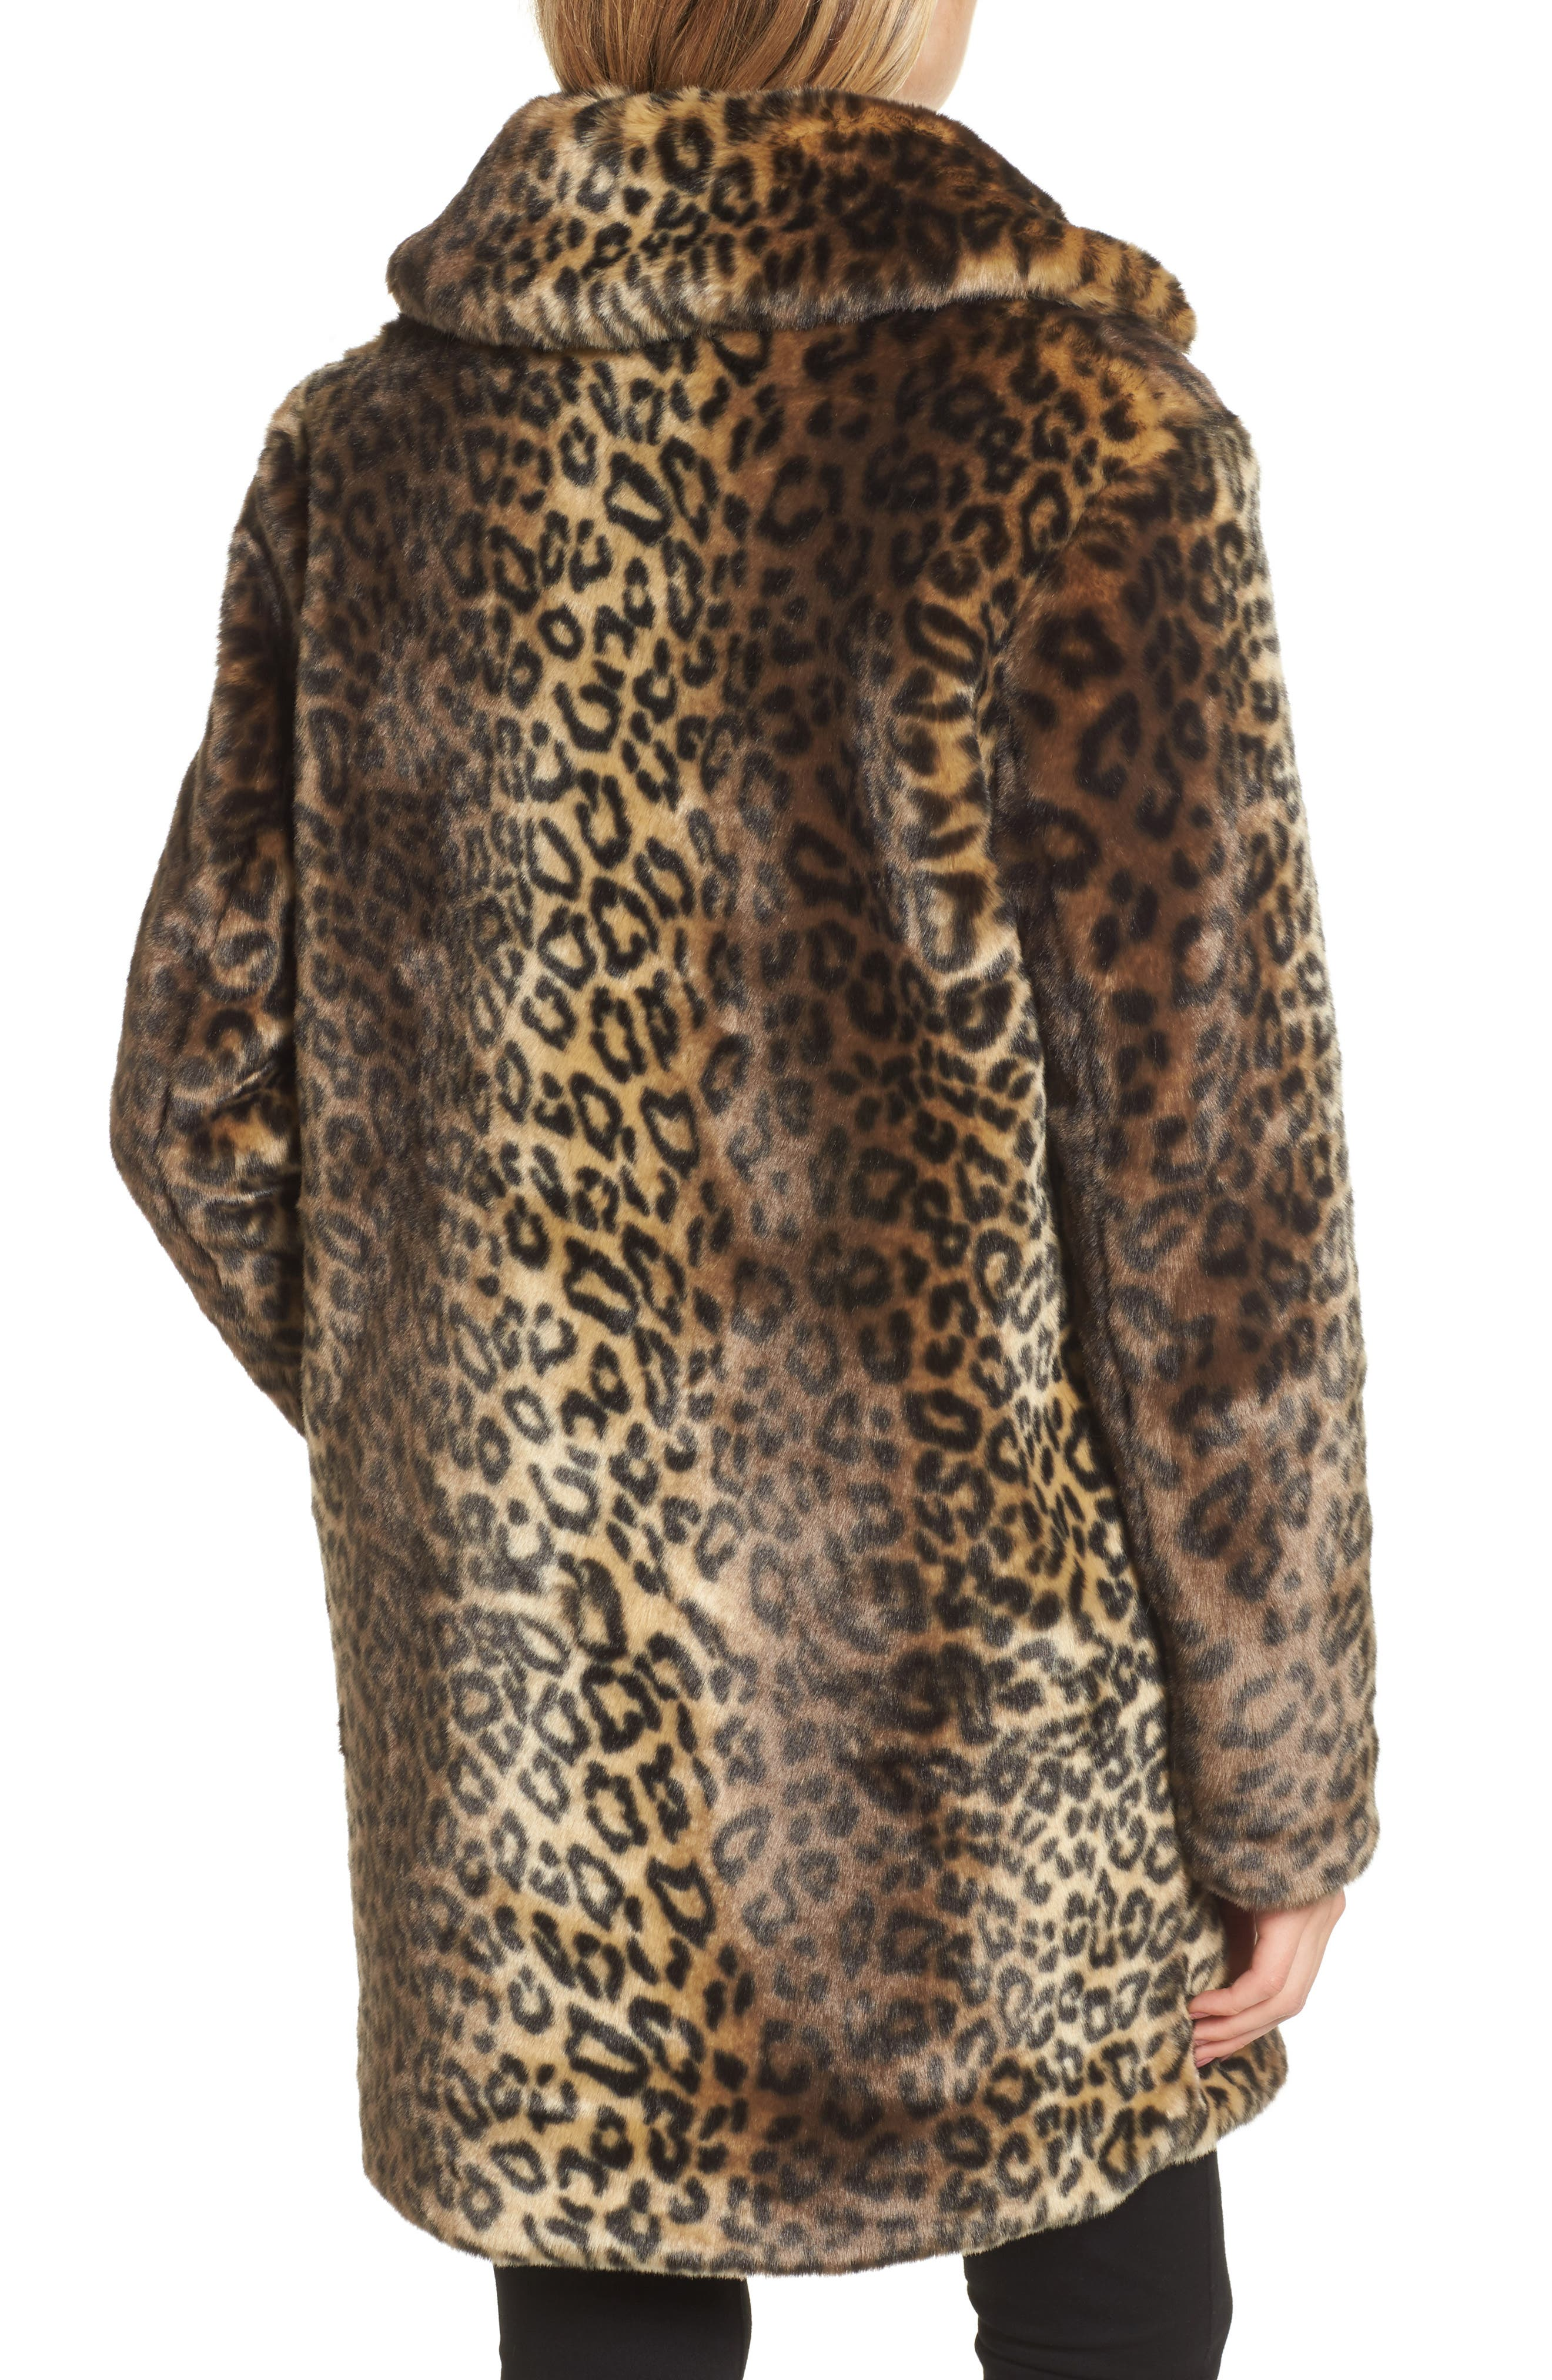 Reversible Cheetah Print Faux Fur Jacket,                             Alternate thumbnail 2, color,                             254